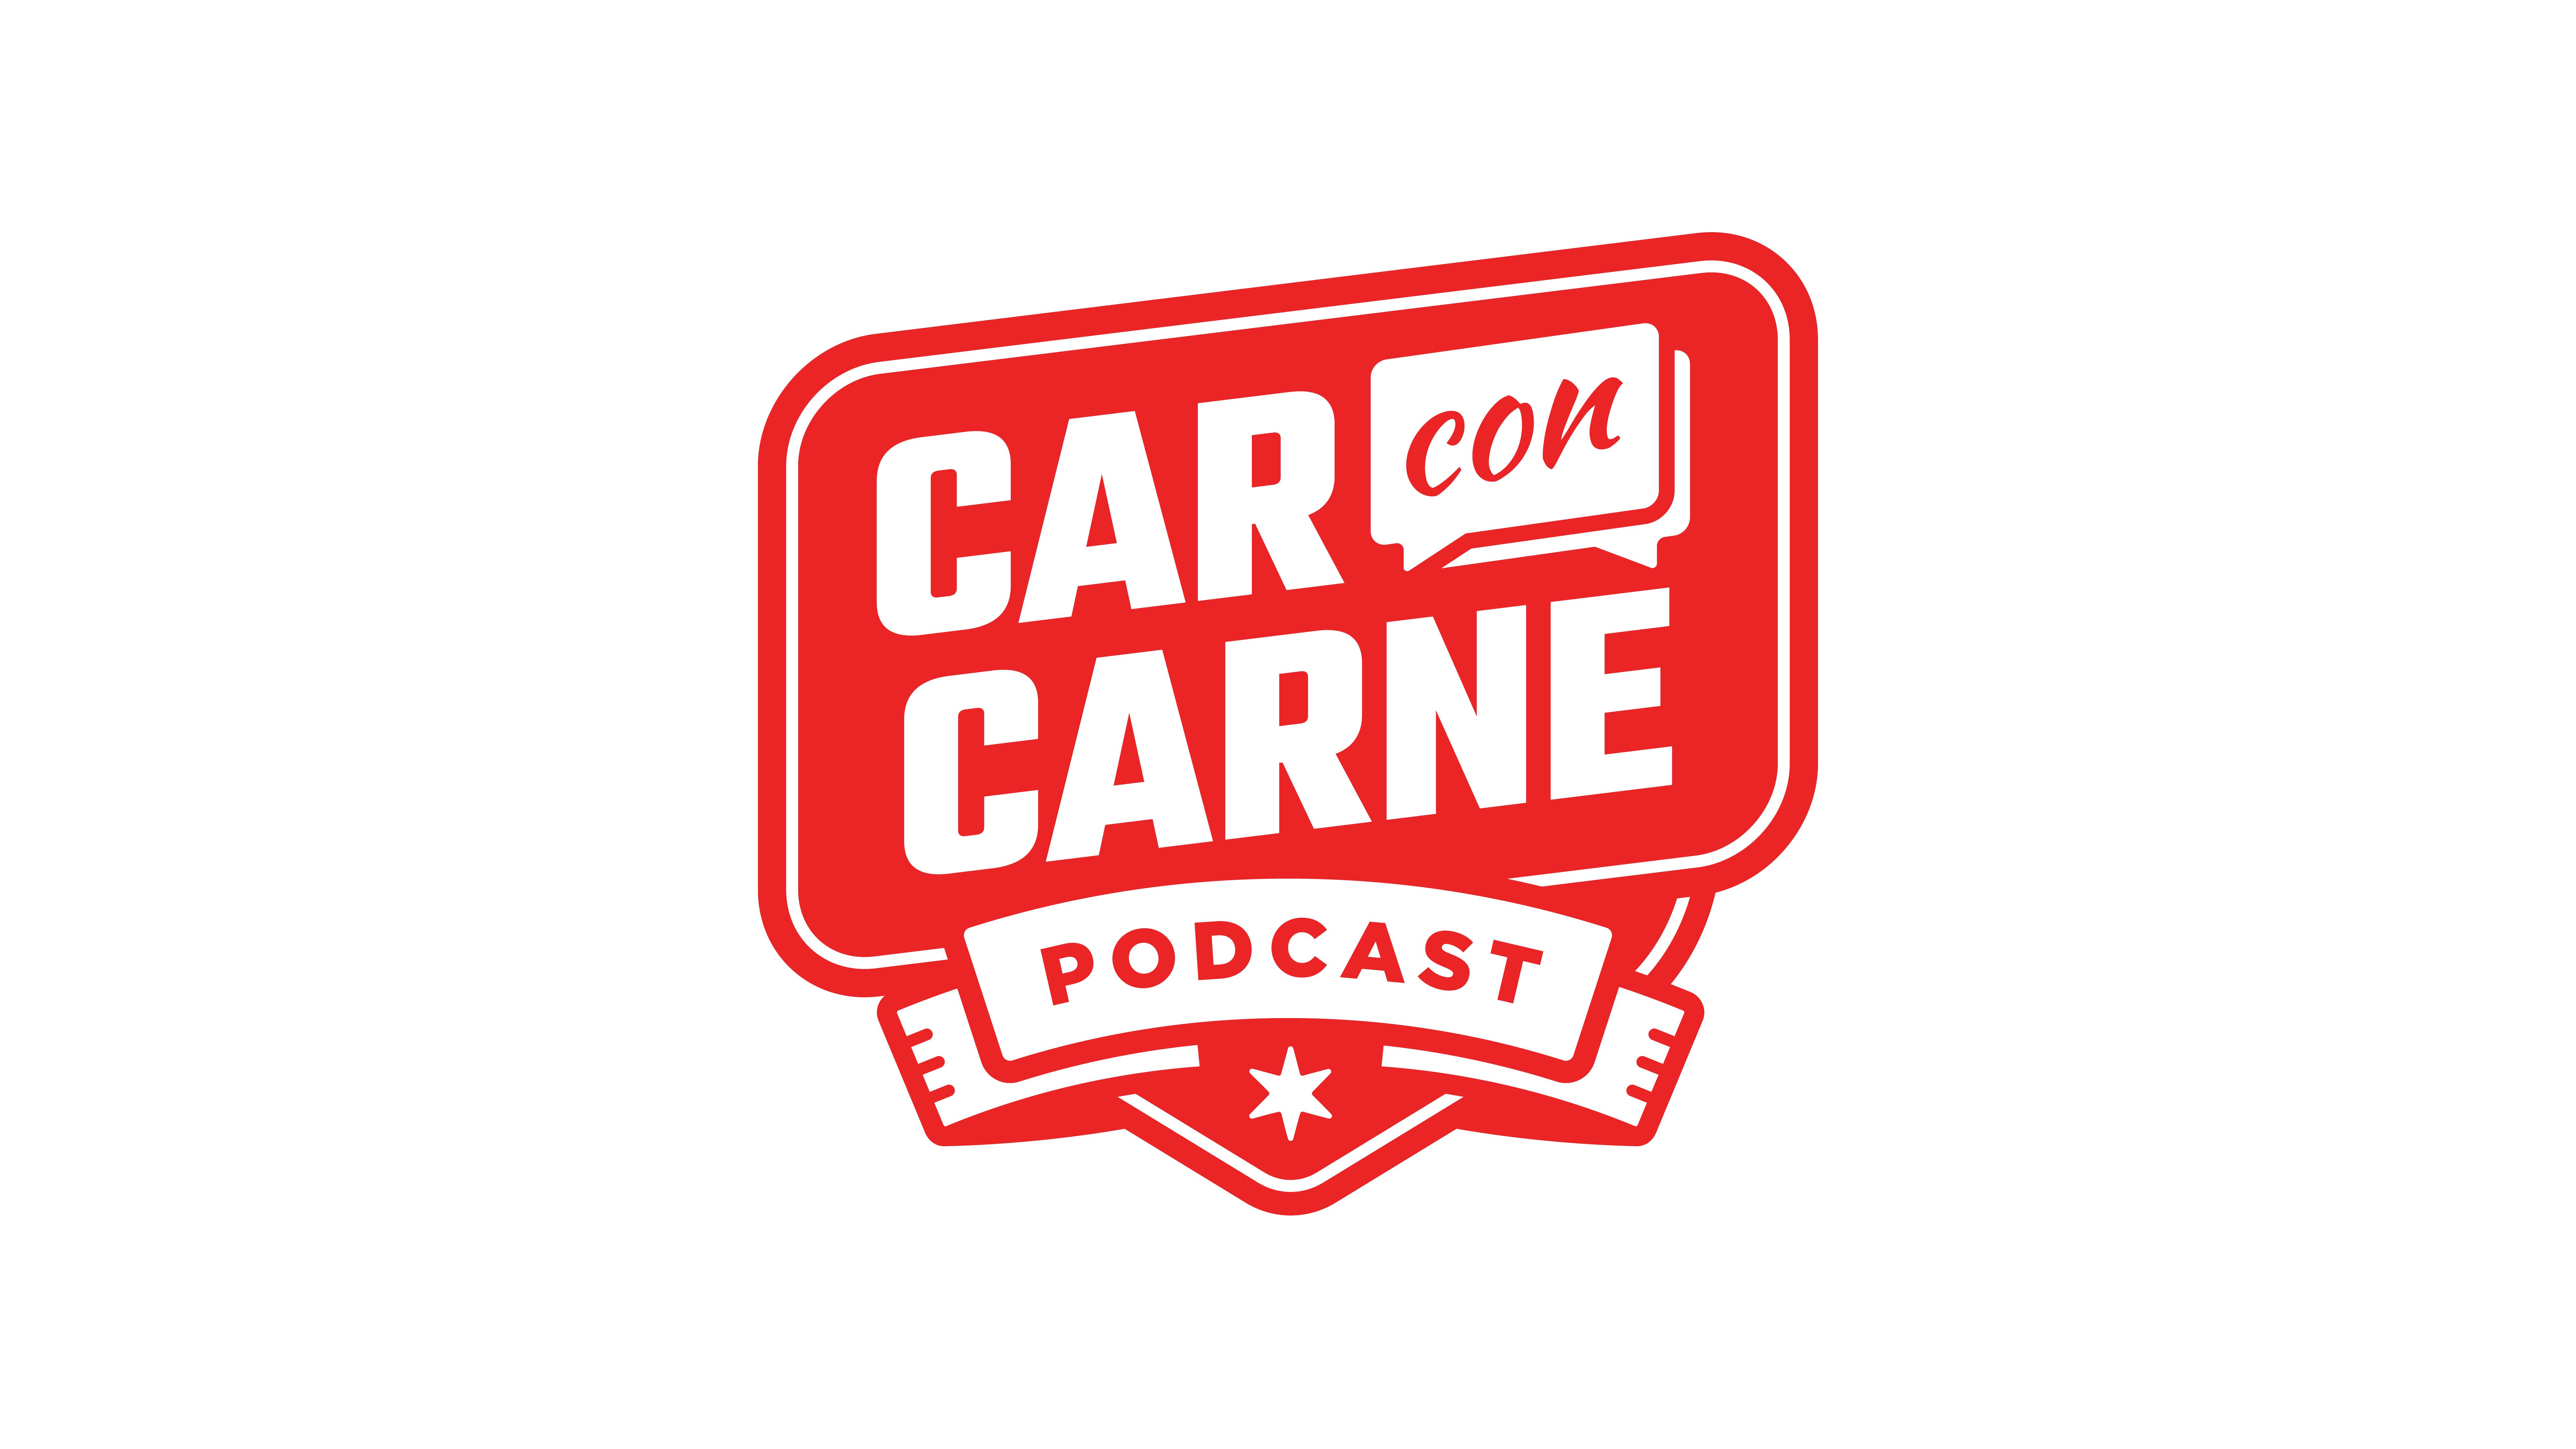 CarConCarne-Logo_RGB